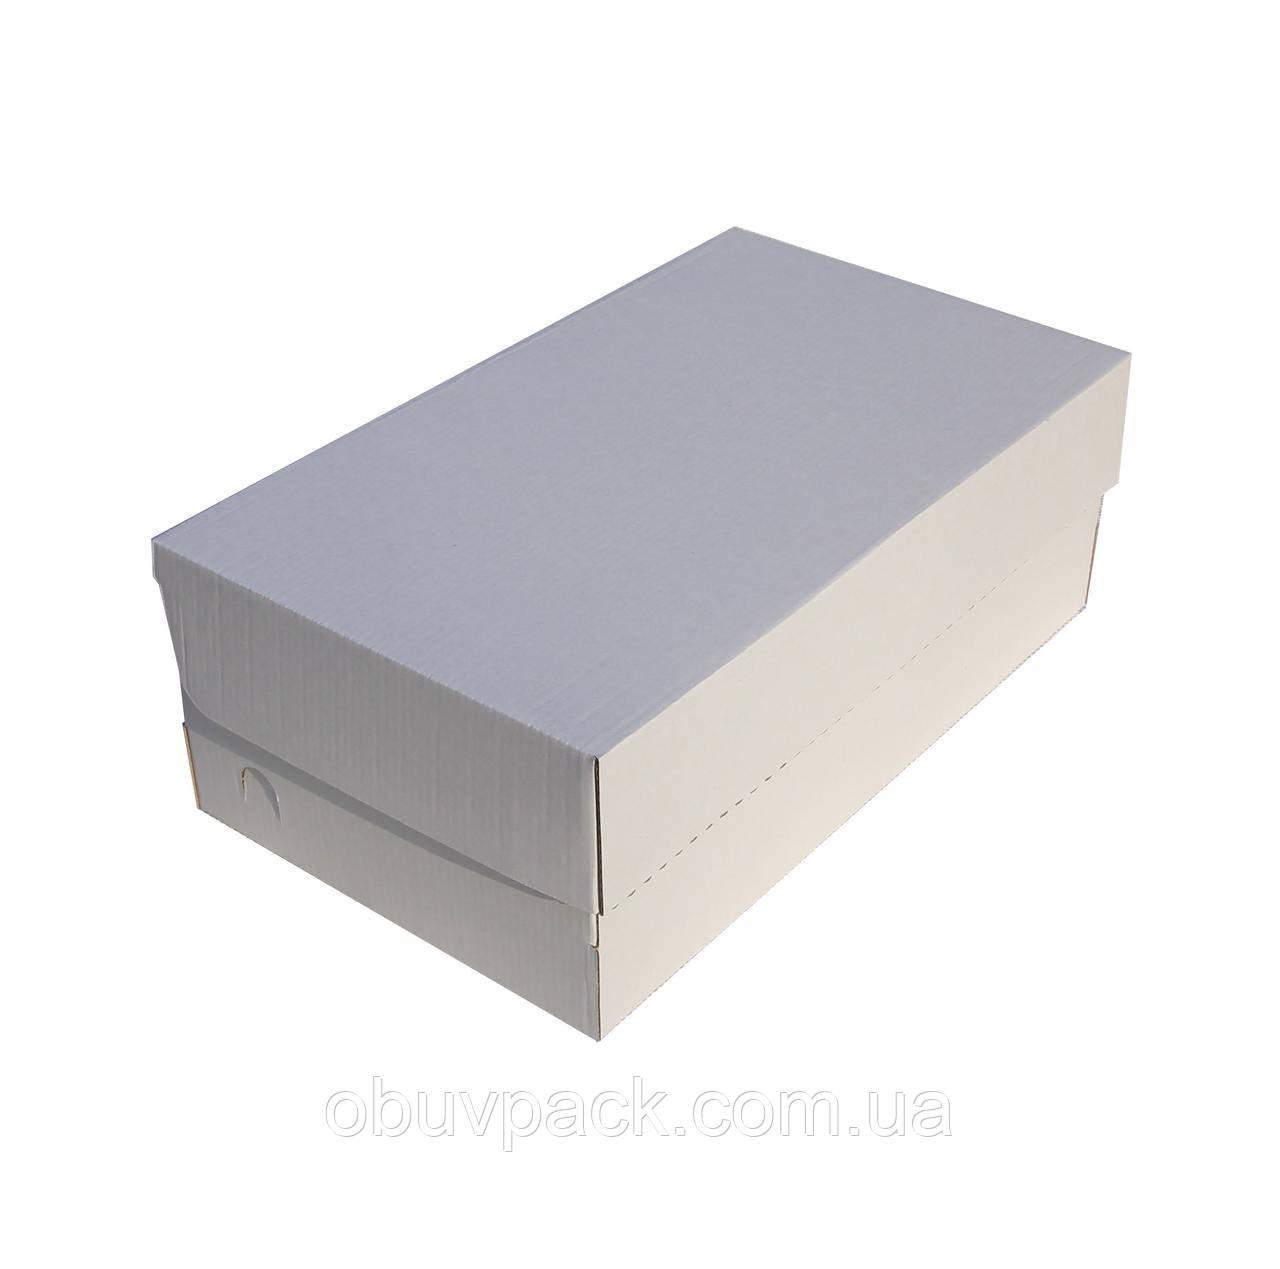 Коробка обувная белая 344х184х120 Мужской туфель малый